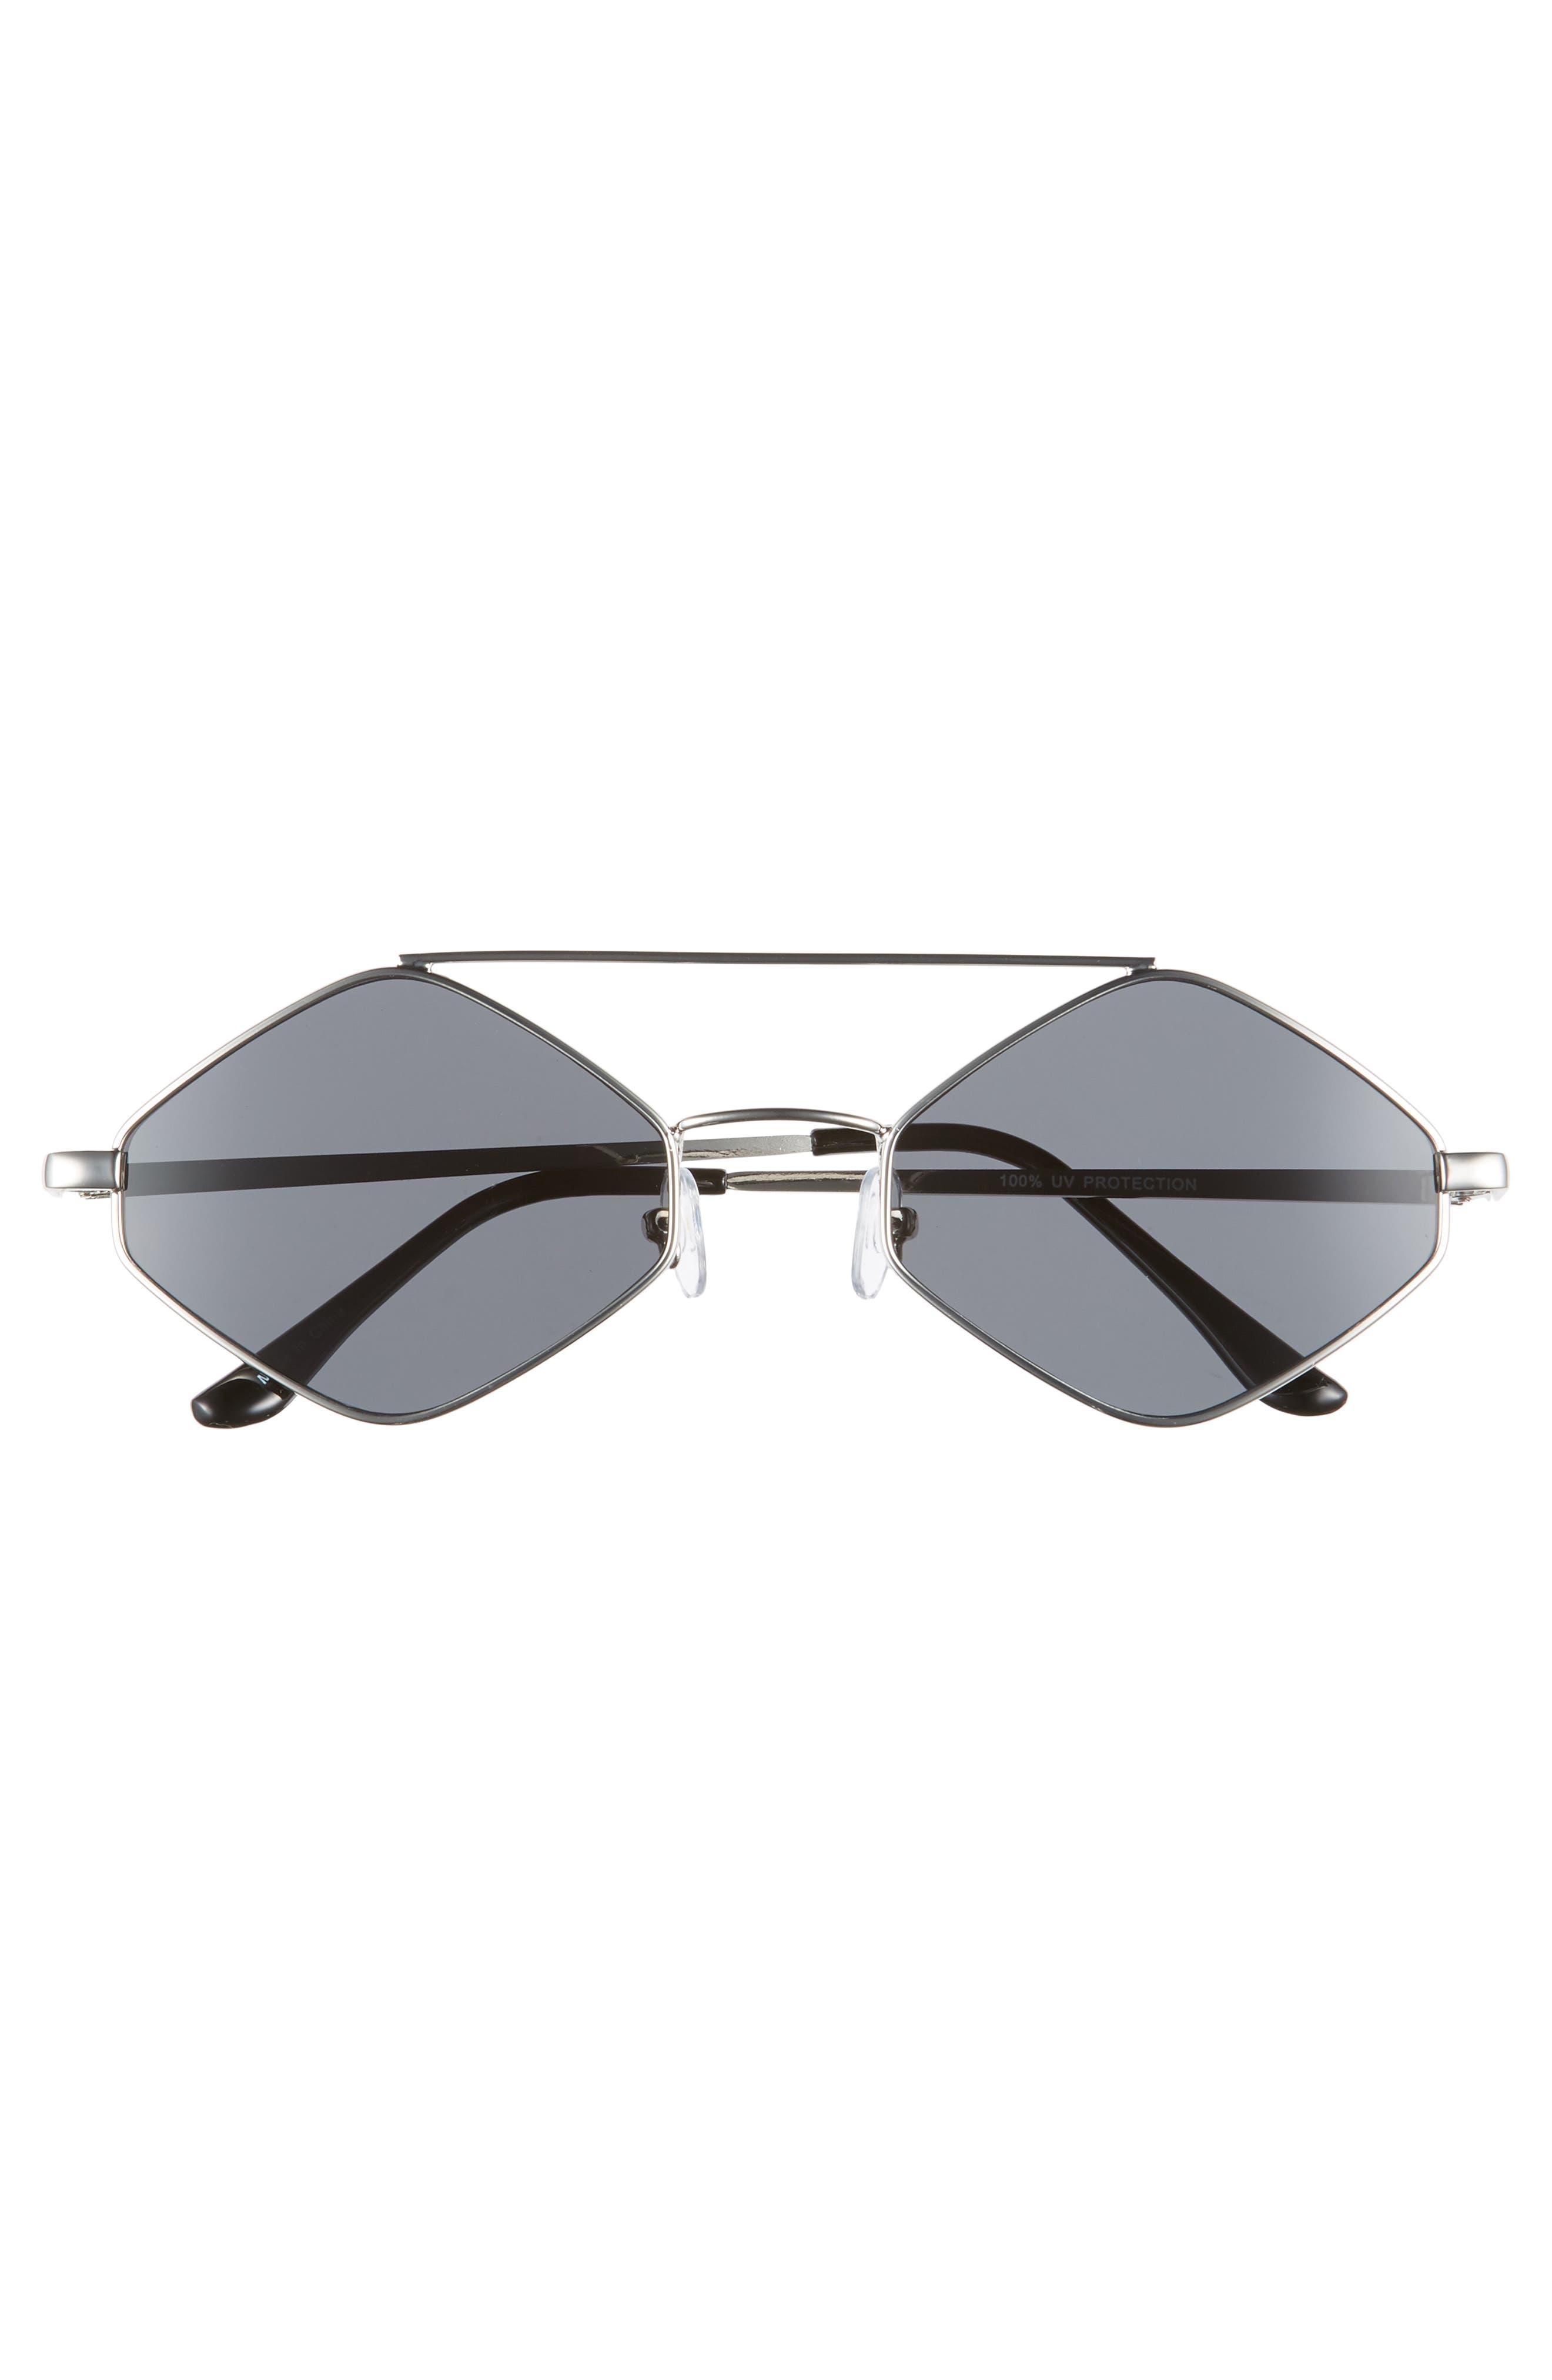 55mm Brow Bar Geometric Sunglasses,                             Alternate thumbnail 3, color,                             040